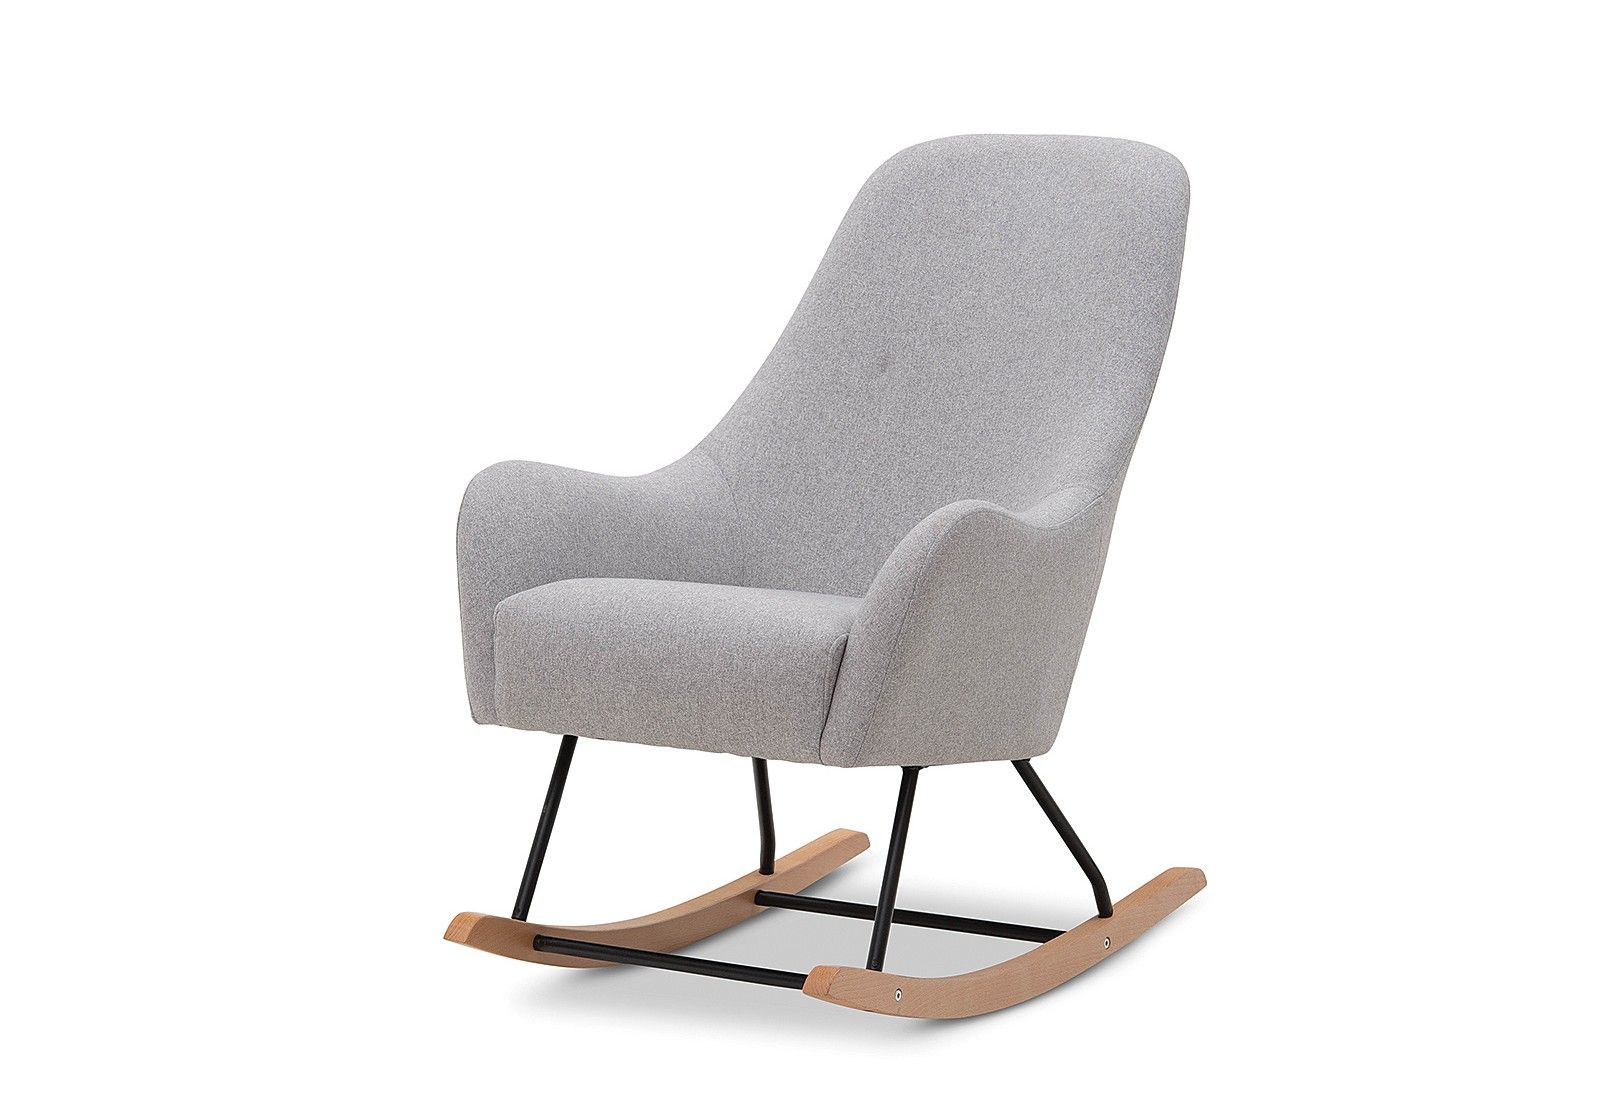 Peachy Gwen Accent Rocking Chair Amart Furniture In 2019 Dailytribune Chair Design For Home Dailytribuneorg